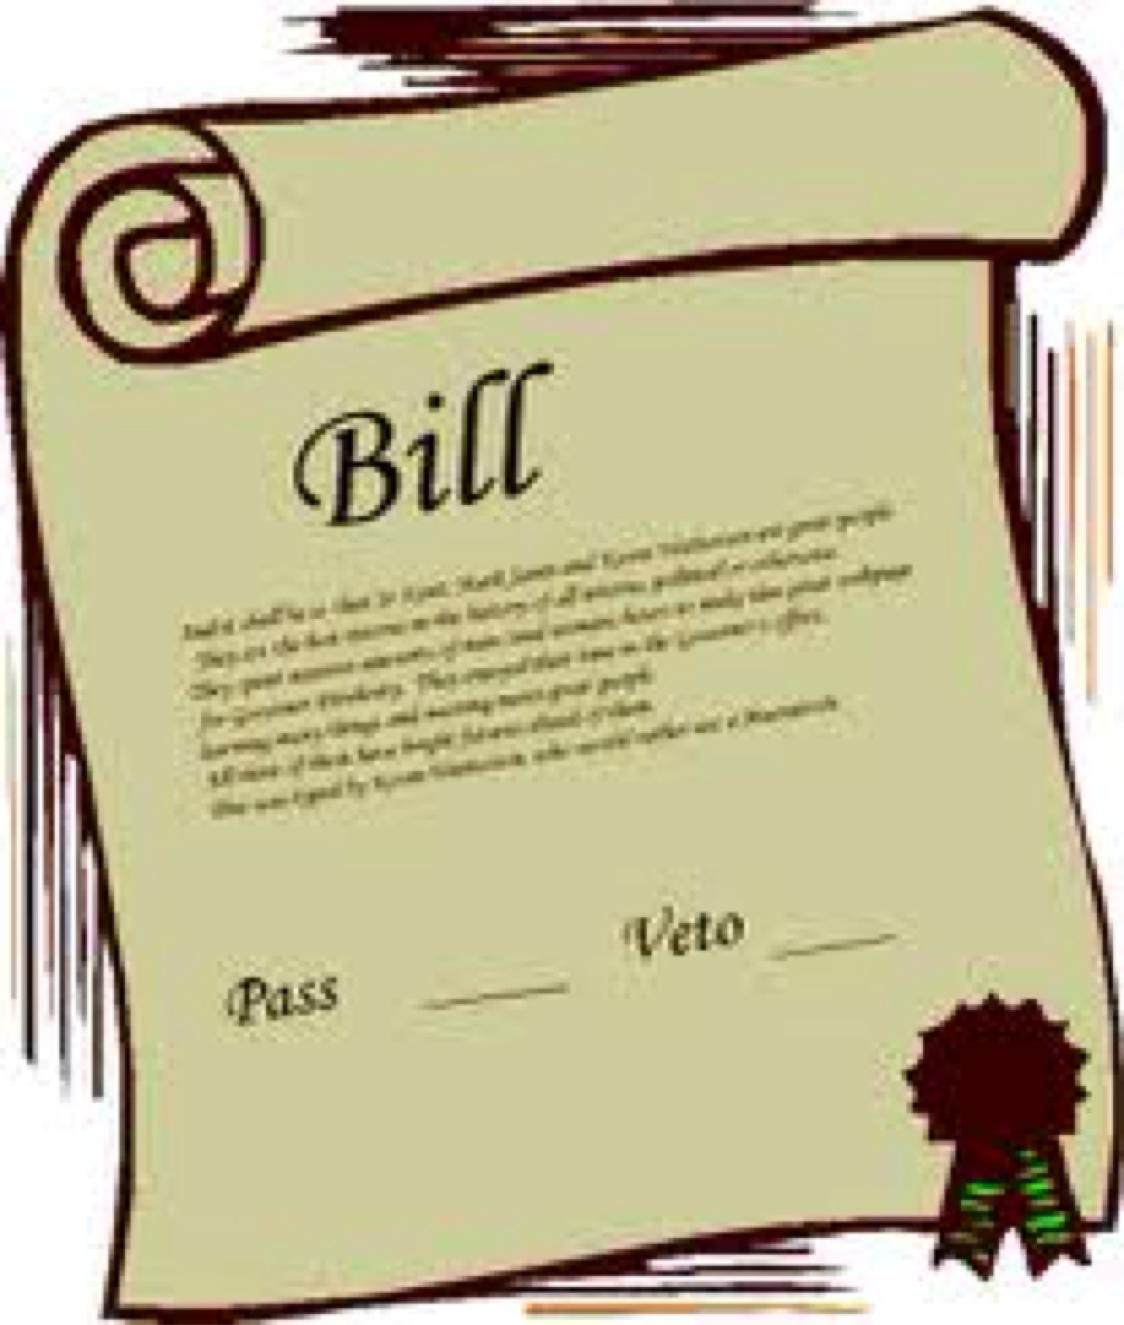 Bills clipart government bill.  branches of u